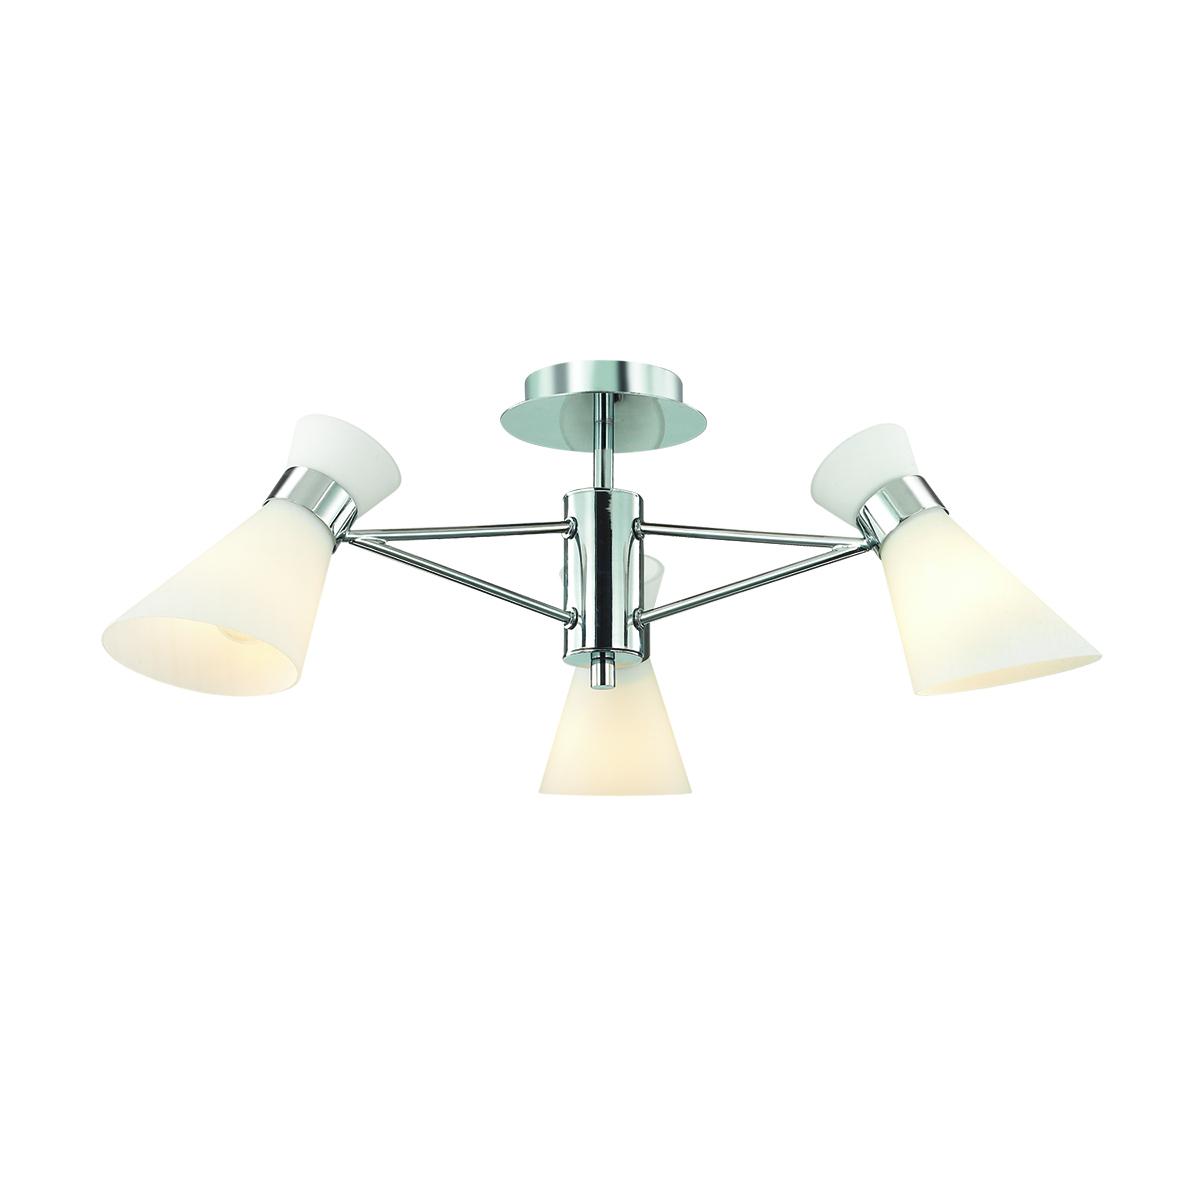 Потолочная люстра Lumion Moderni Laconica 3498/3, 3xE14x40W, хром, белый, металл, стекло - фото 1